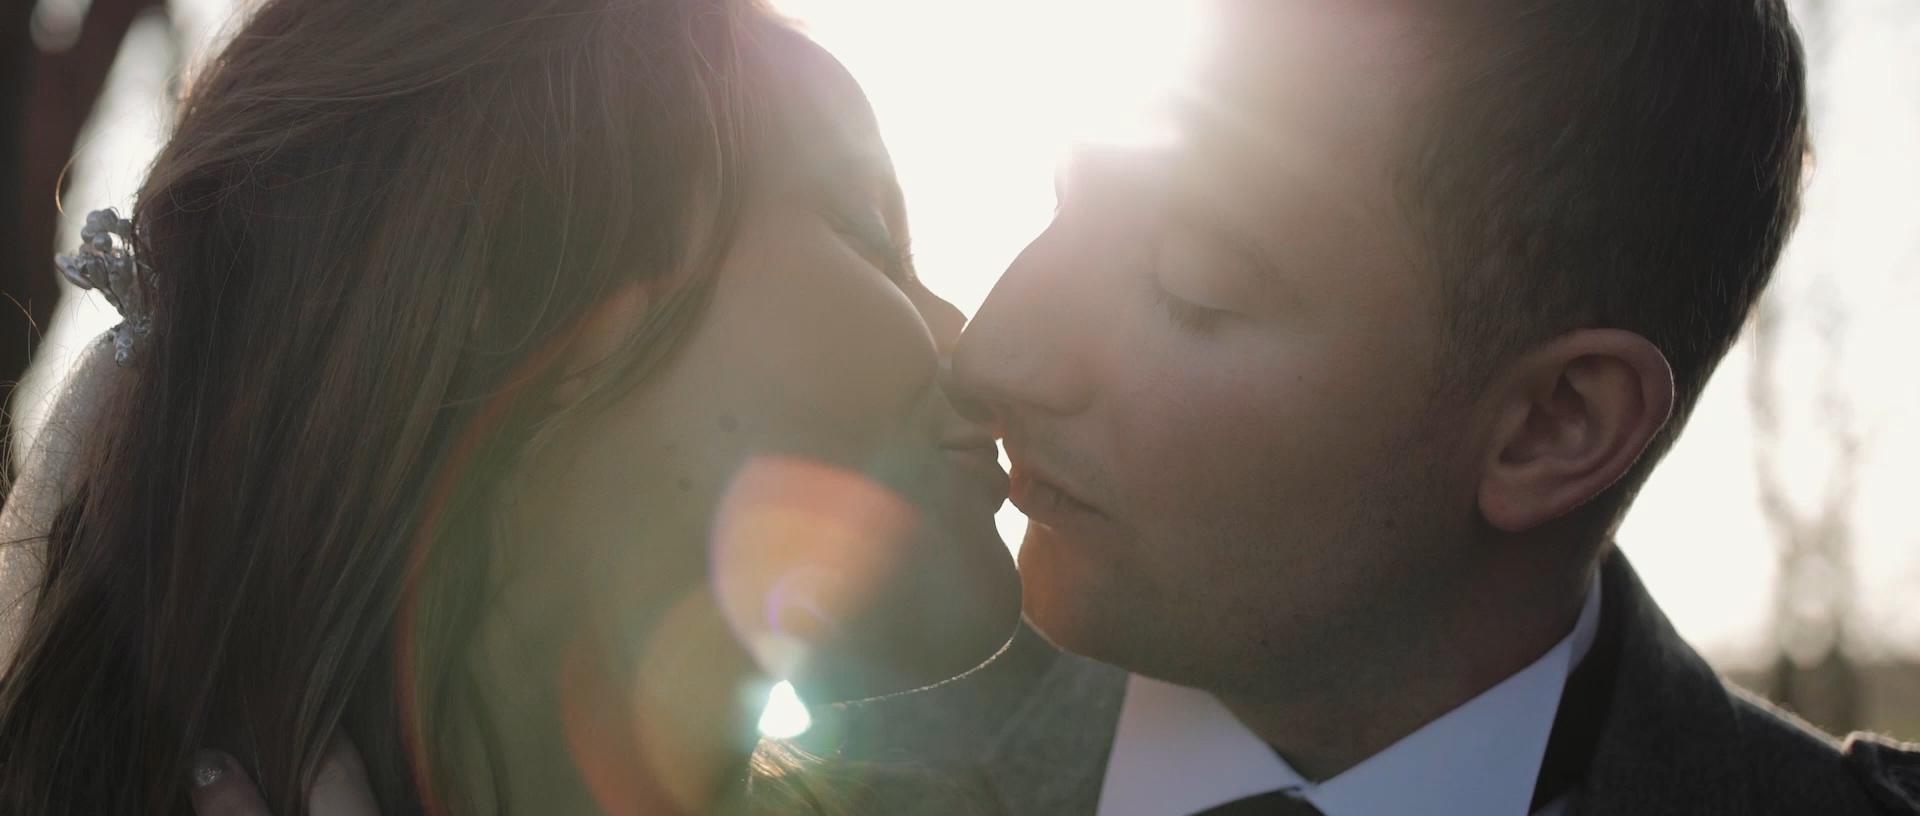 glencoe-wedding-videographer_LL_03.jpg